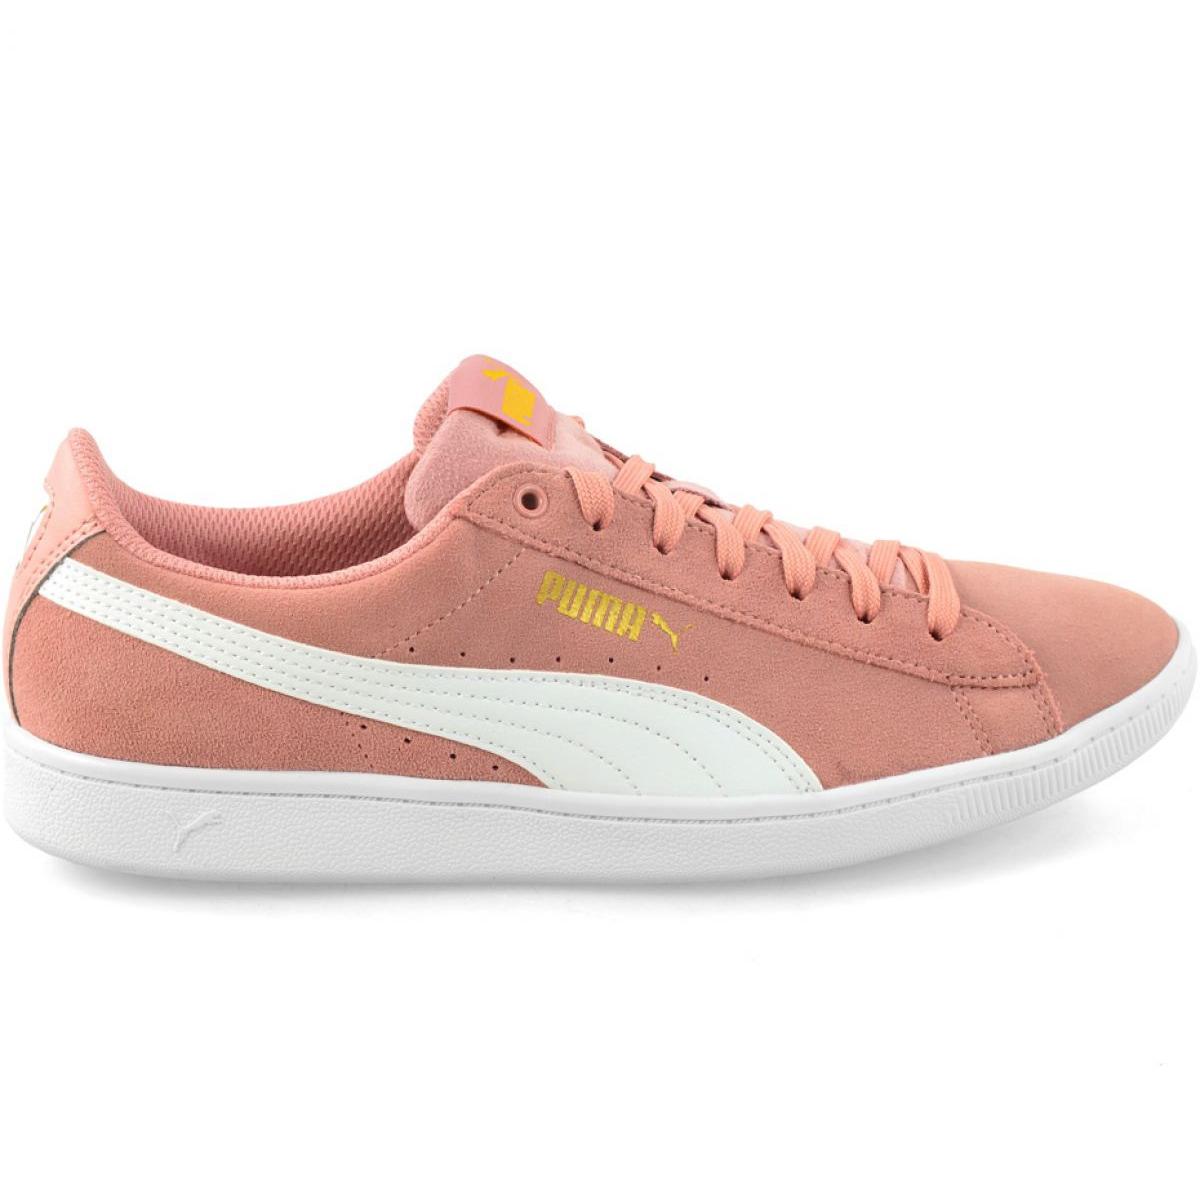 Shoes Puma Vikky Peach Beige-Puma White